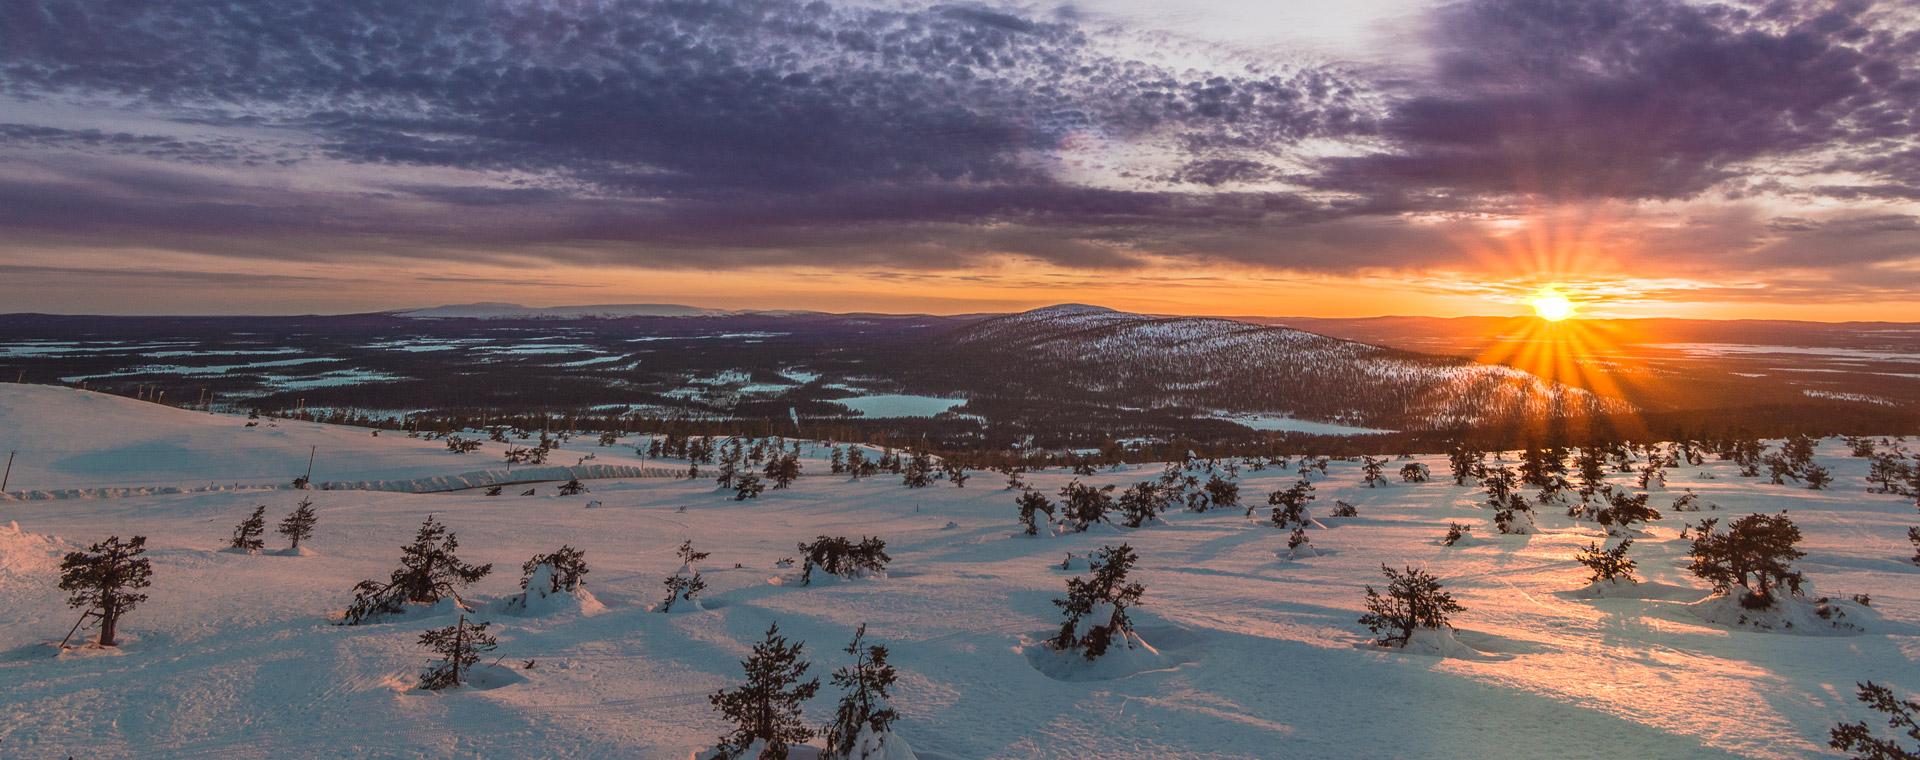 Image Levi, Laponie finlandaise